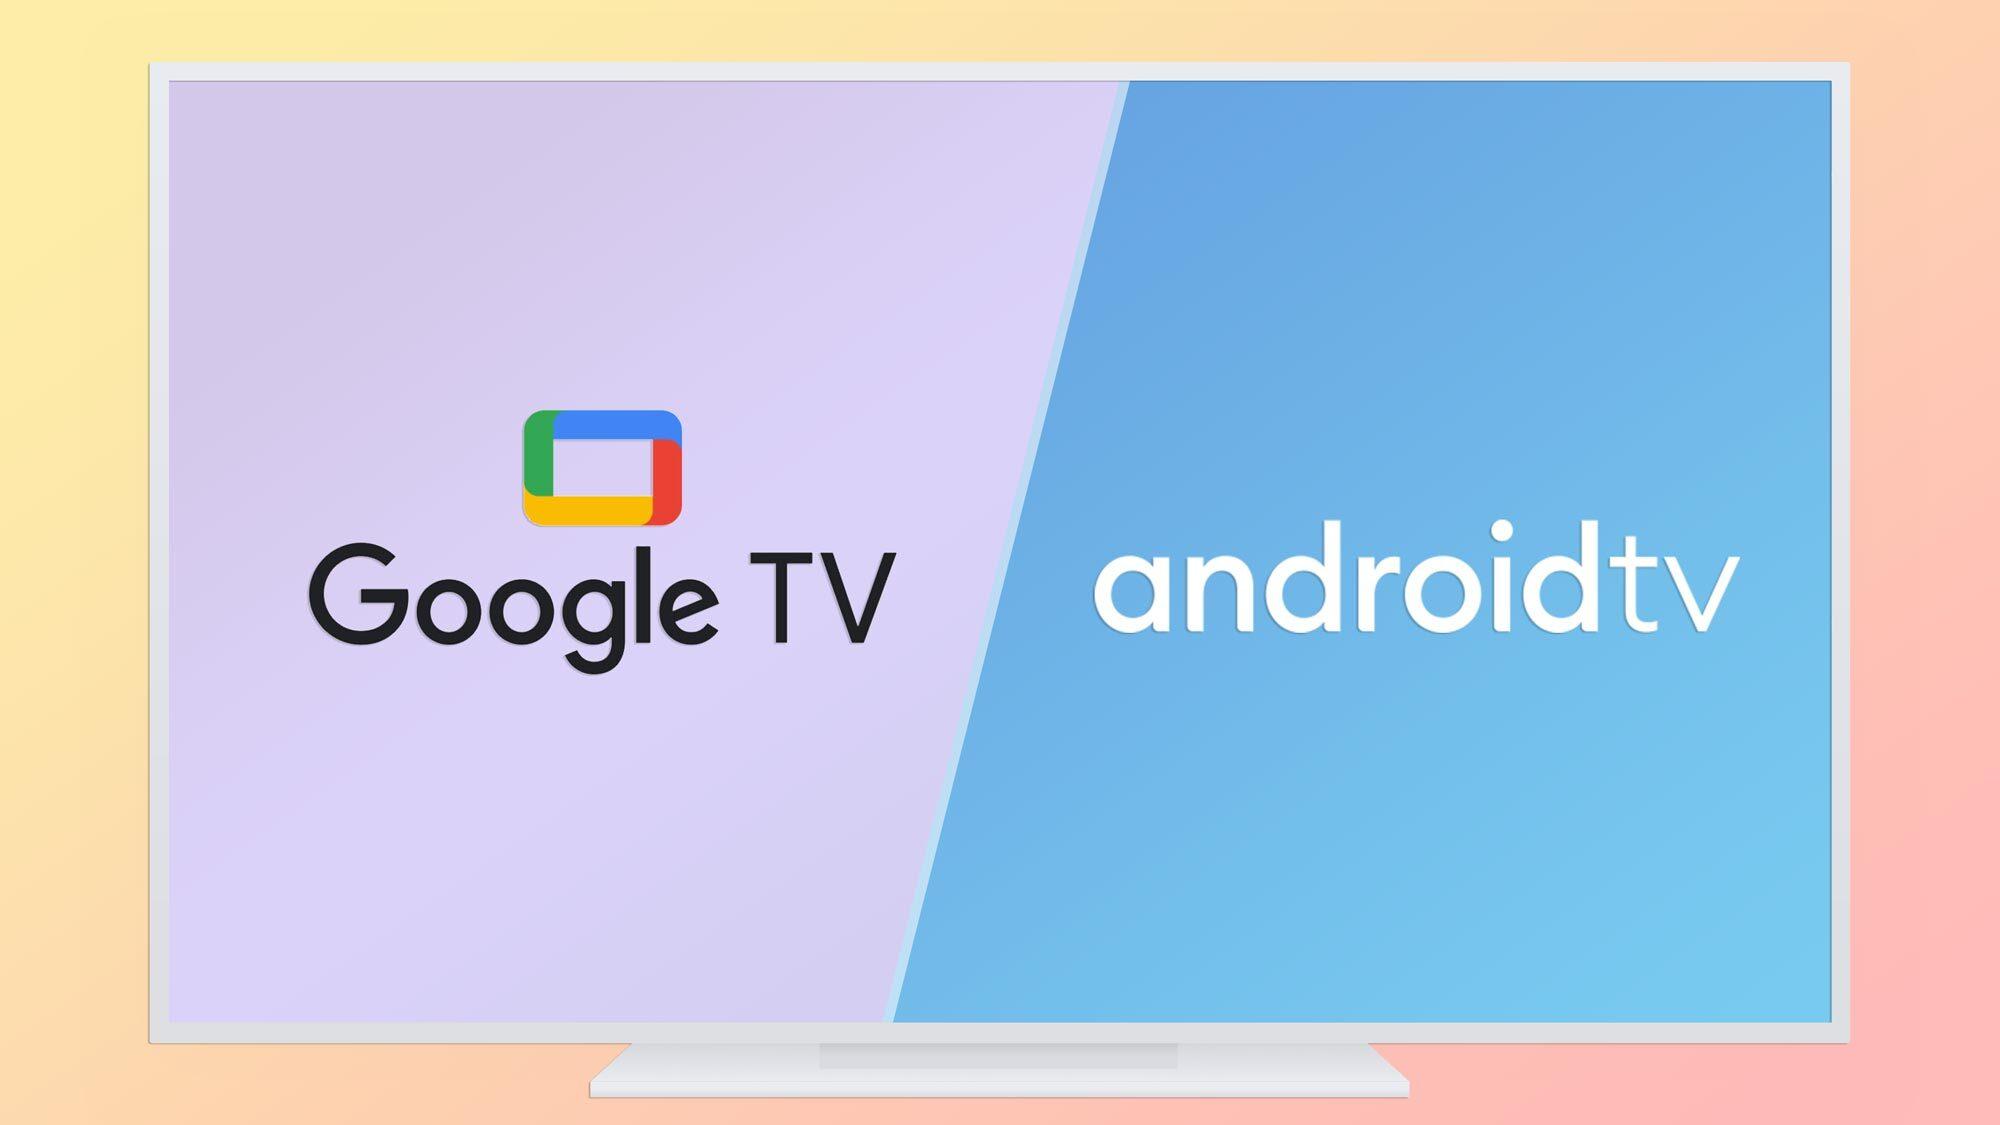 Google TV vs. Android TV